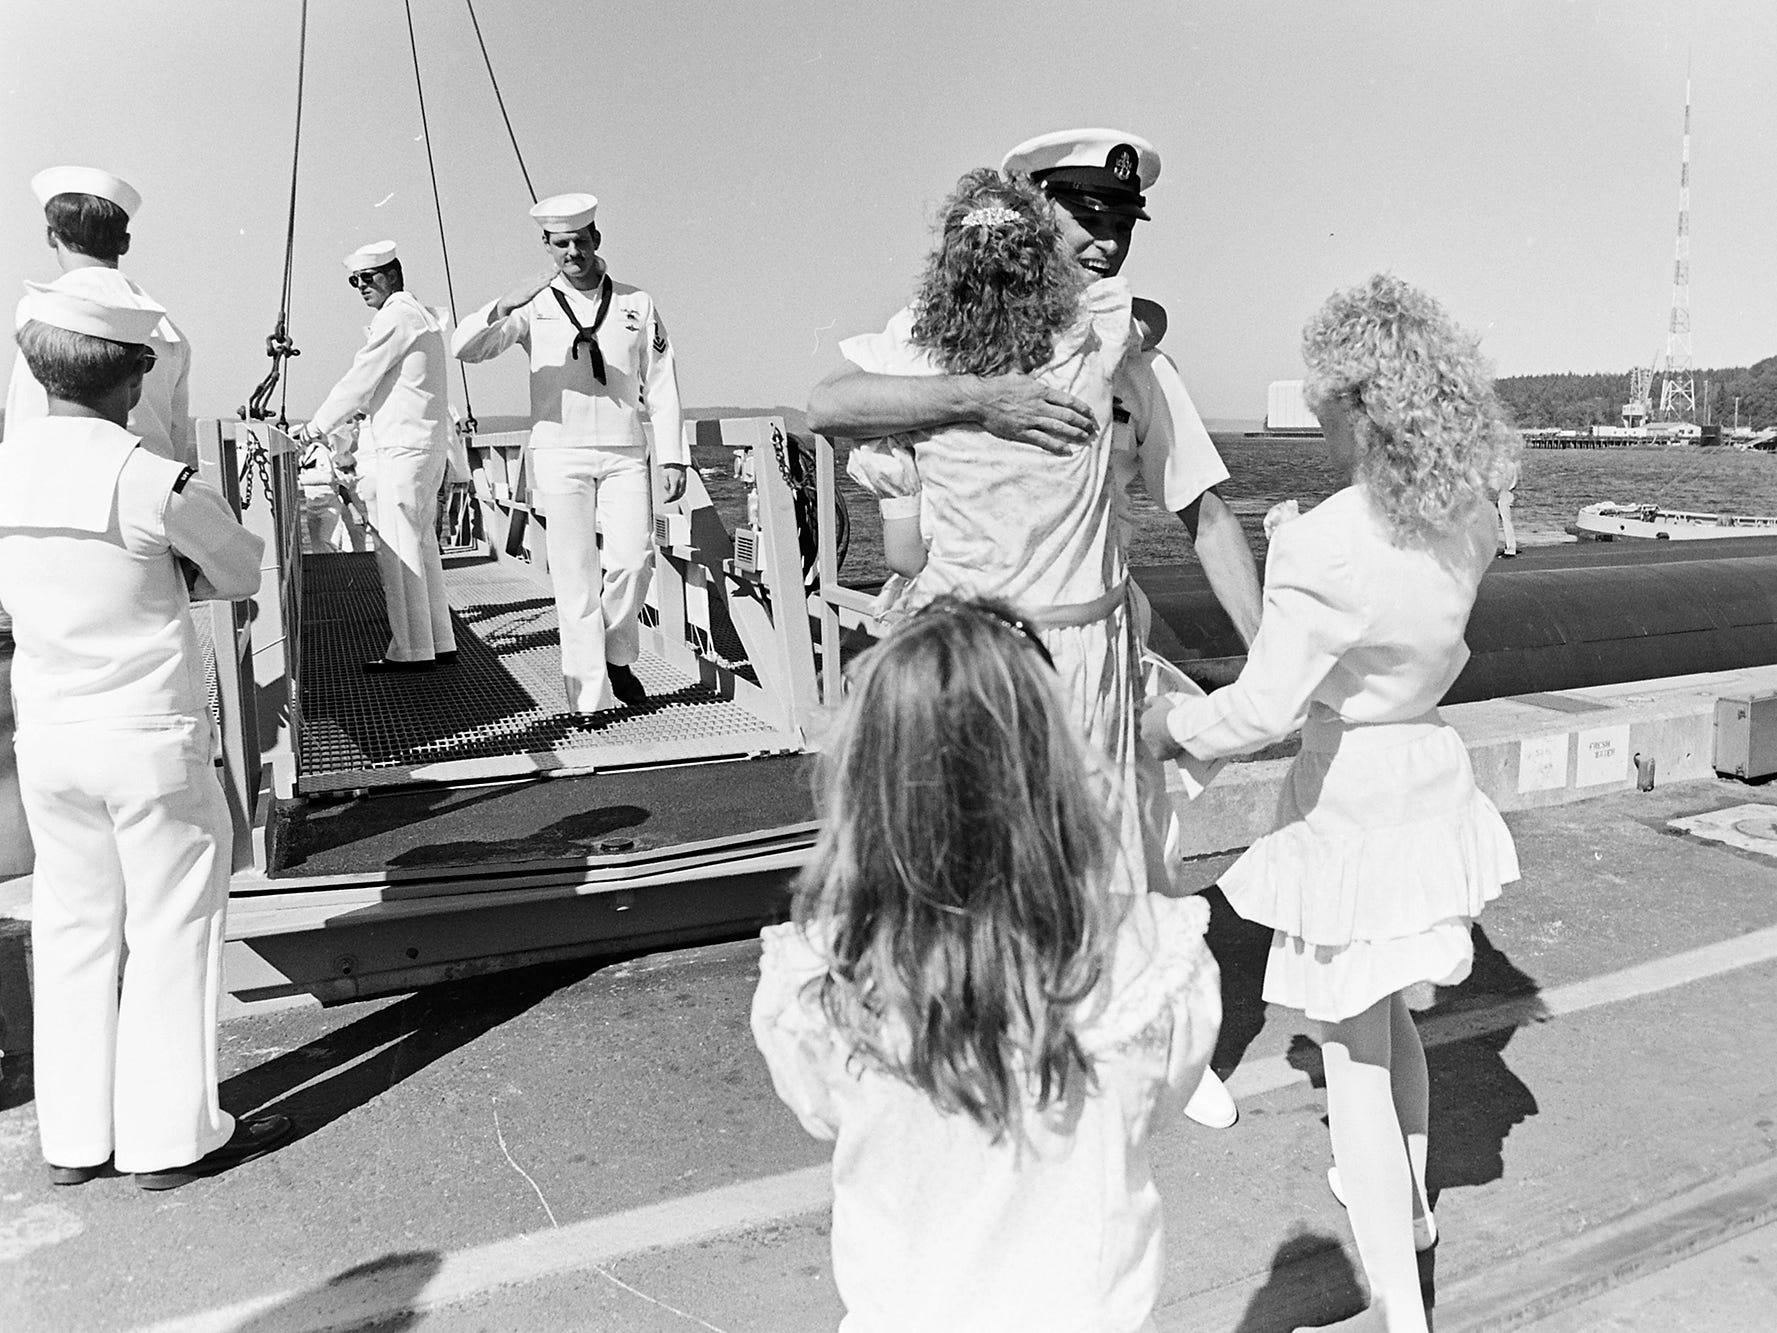 09/22/88 Alabama Trident 100 Sailing